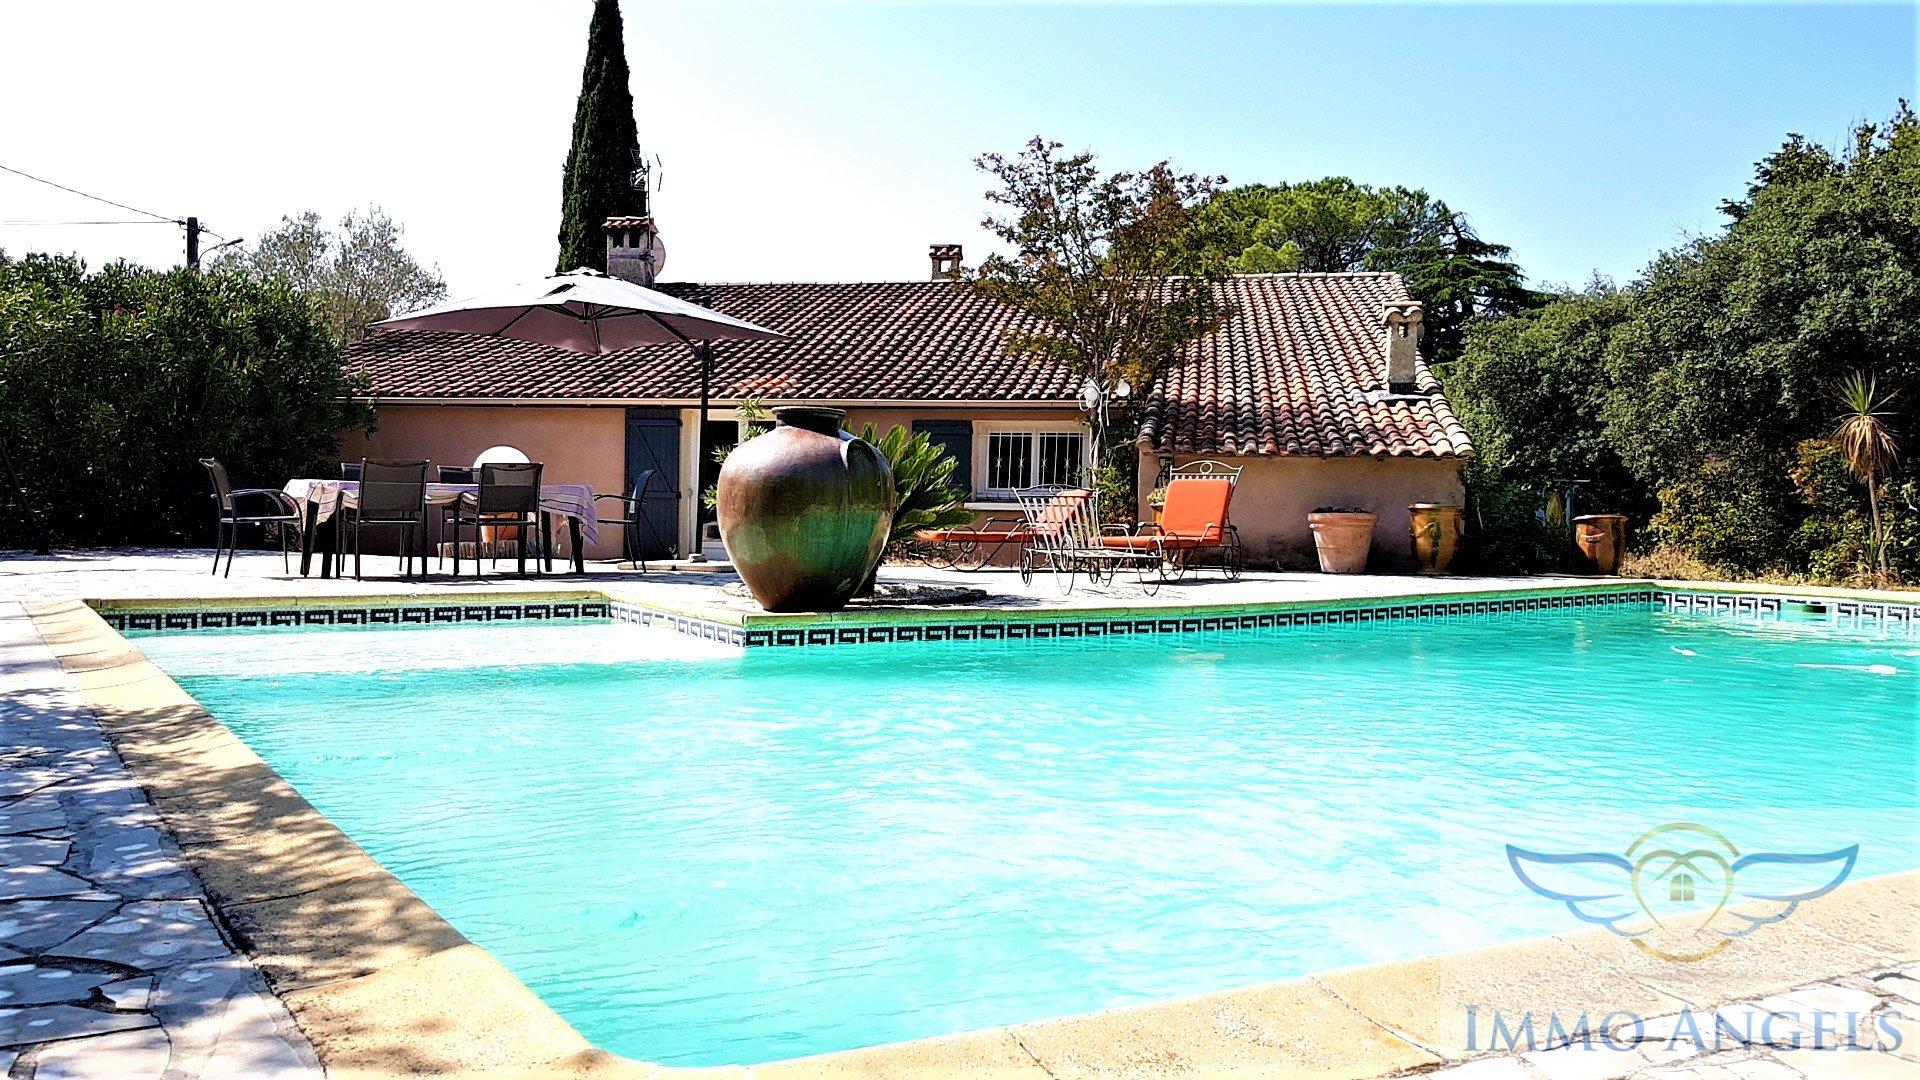 Vente Nîmes, Maison De 230M², Terrain 2300M², Piscine avec Piscine Montfavet